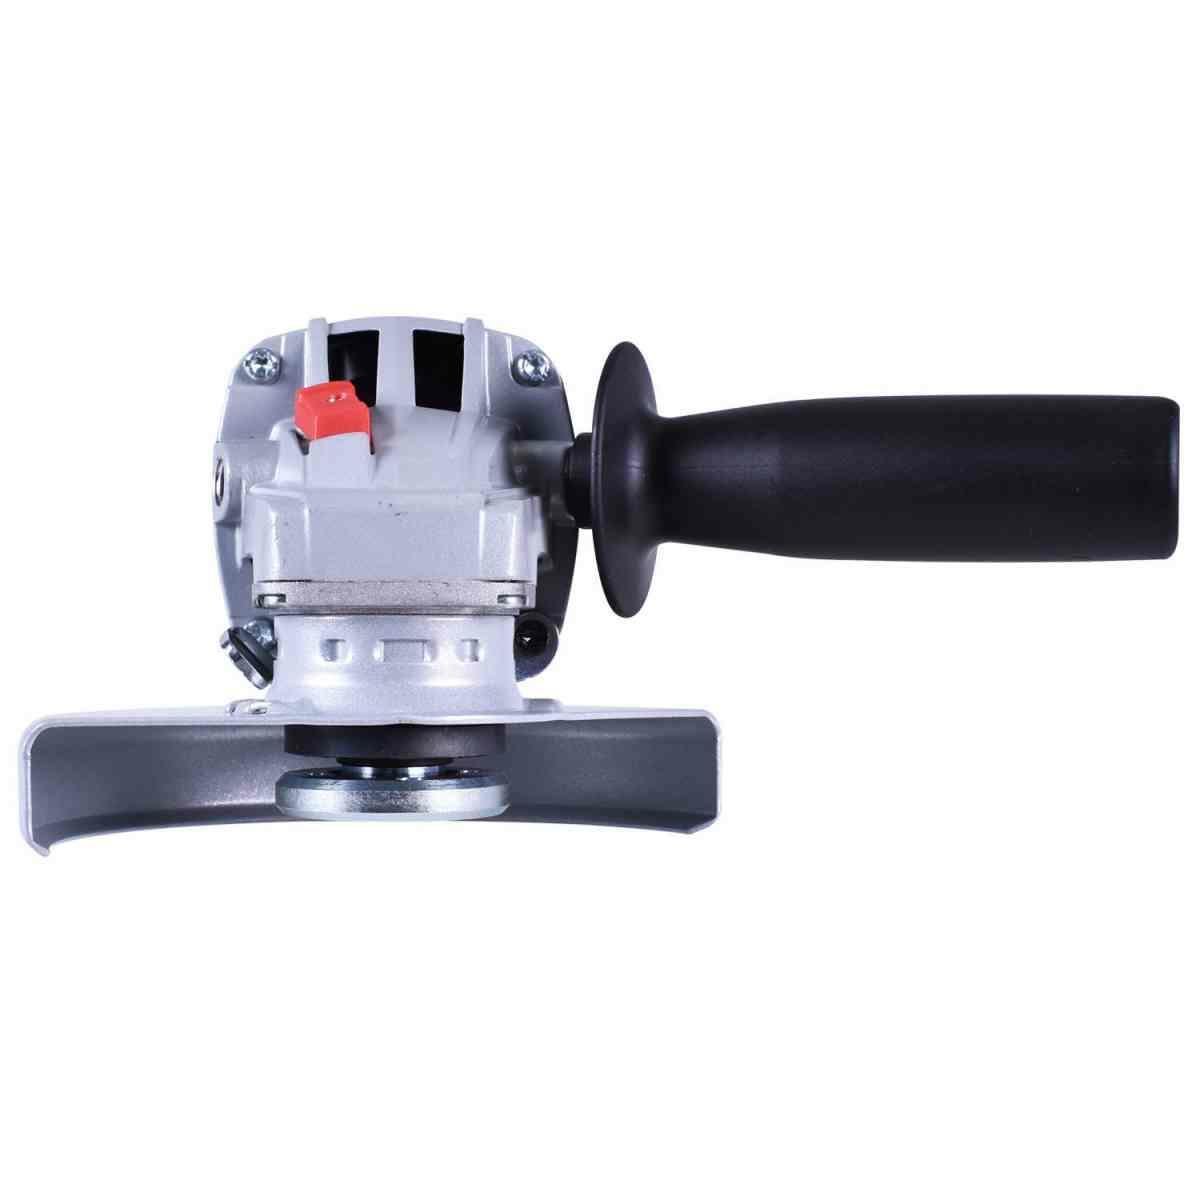 Esmerilhadeira Angular 900W Modelo GWS 9-125 Bosch – 127V